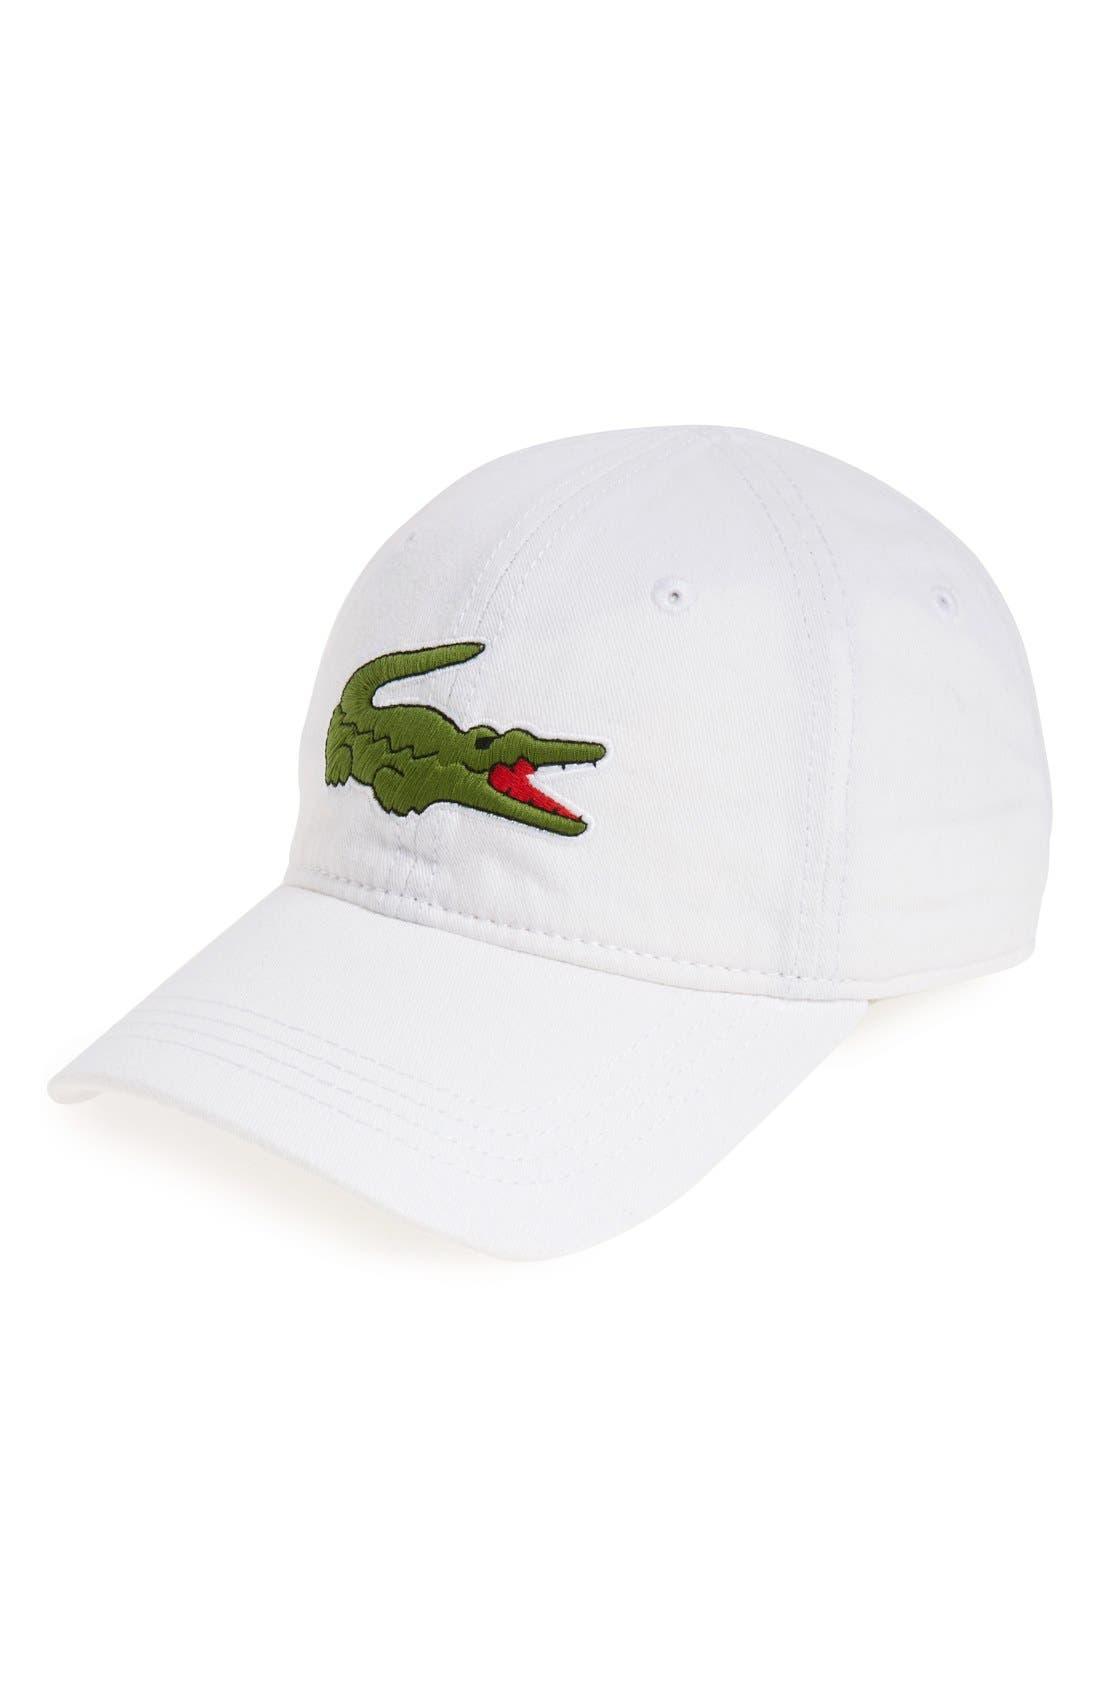 Main Image - Lacoste 'Big Croc' Logo Embroidered Cap